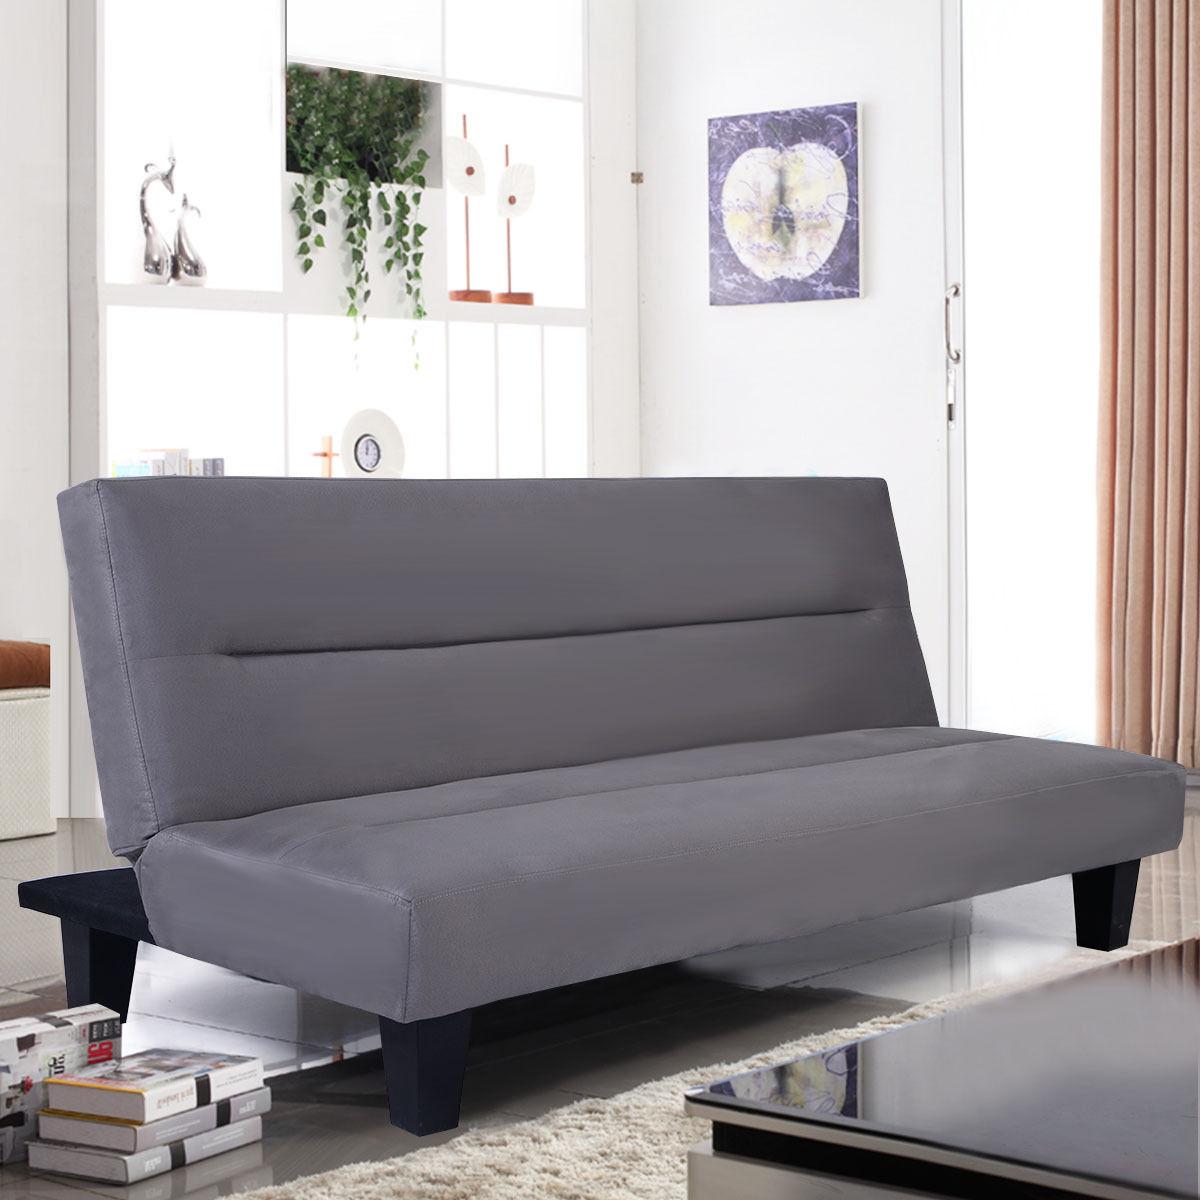 Giantex Microfiber Futon Folding Couch Sofa Bed 6 Mattress Sleep Recliner Lounger Gray Home Living Room Furniture HW51467GR 100% cotton dark blue gray orange green bed sofa plane travel home blanket